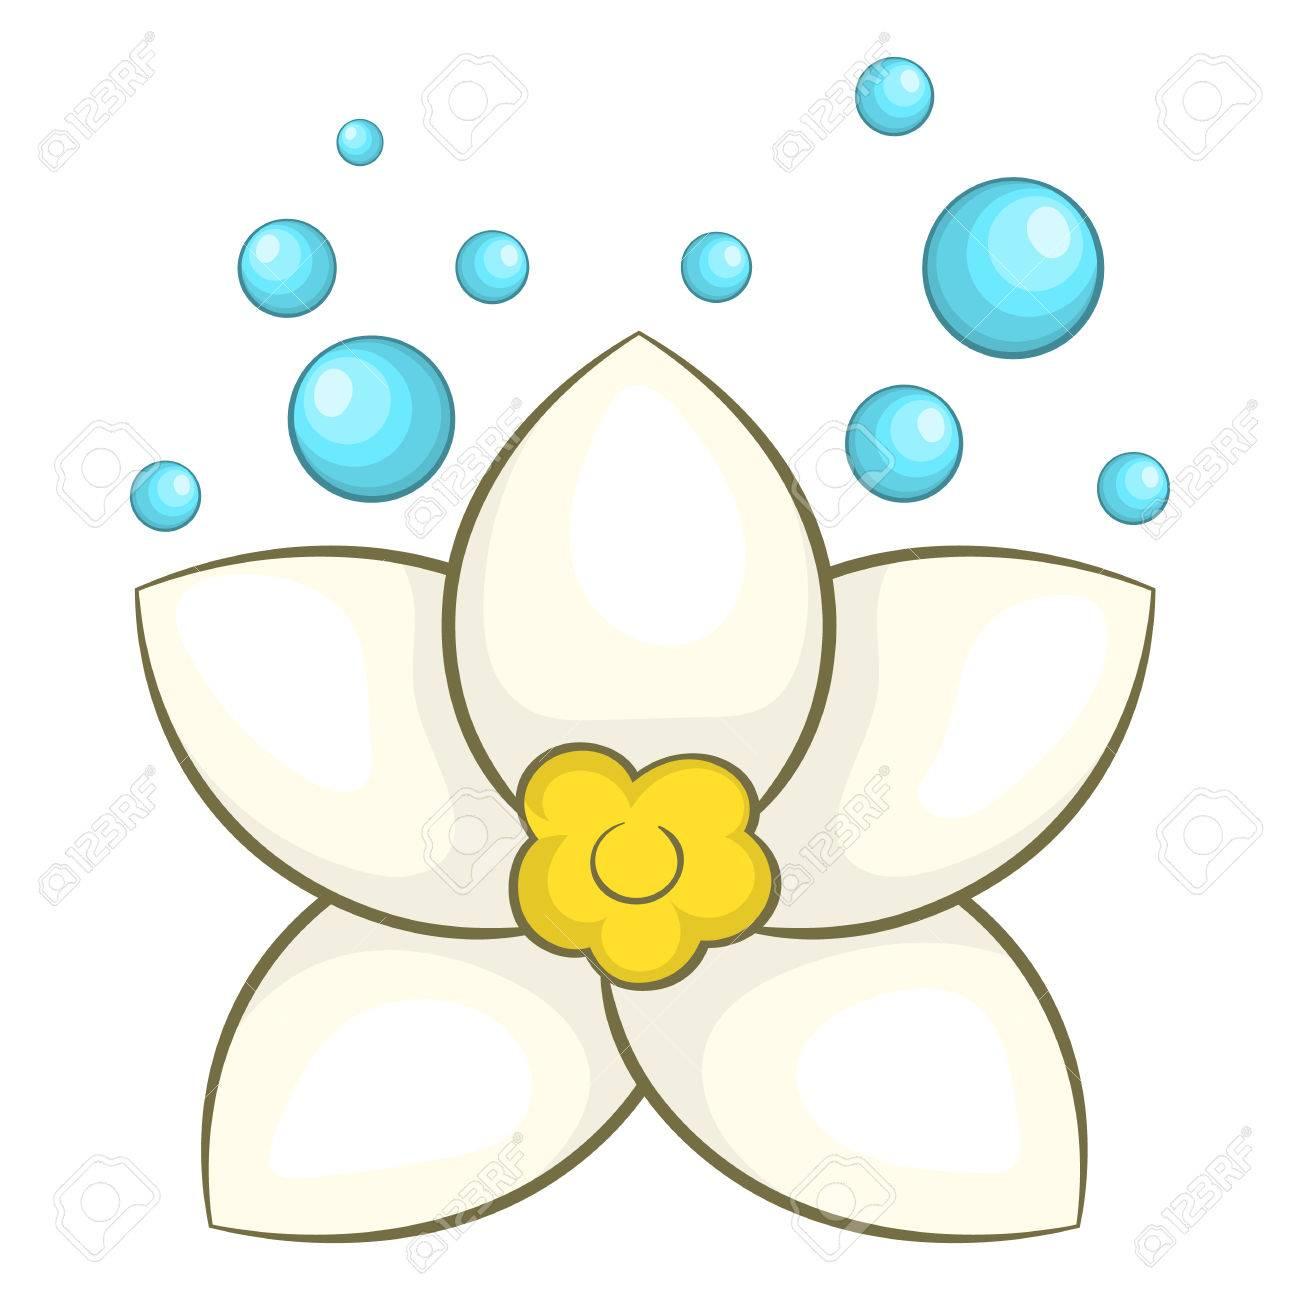 White Lotus Flower Icon In Cartoon Style On A White Background